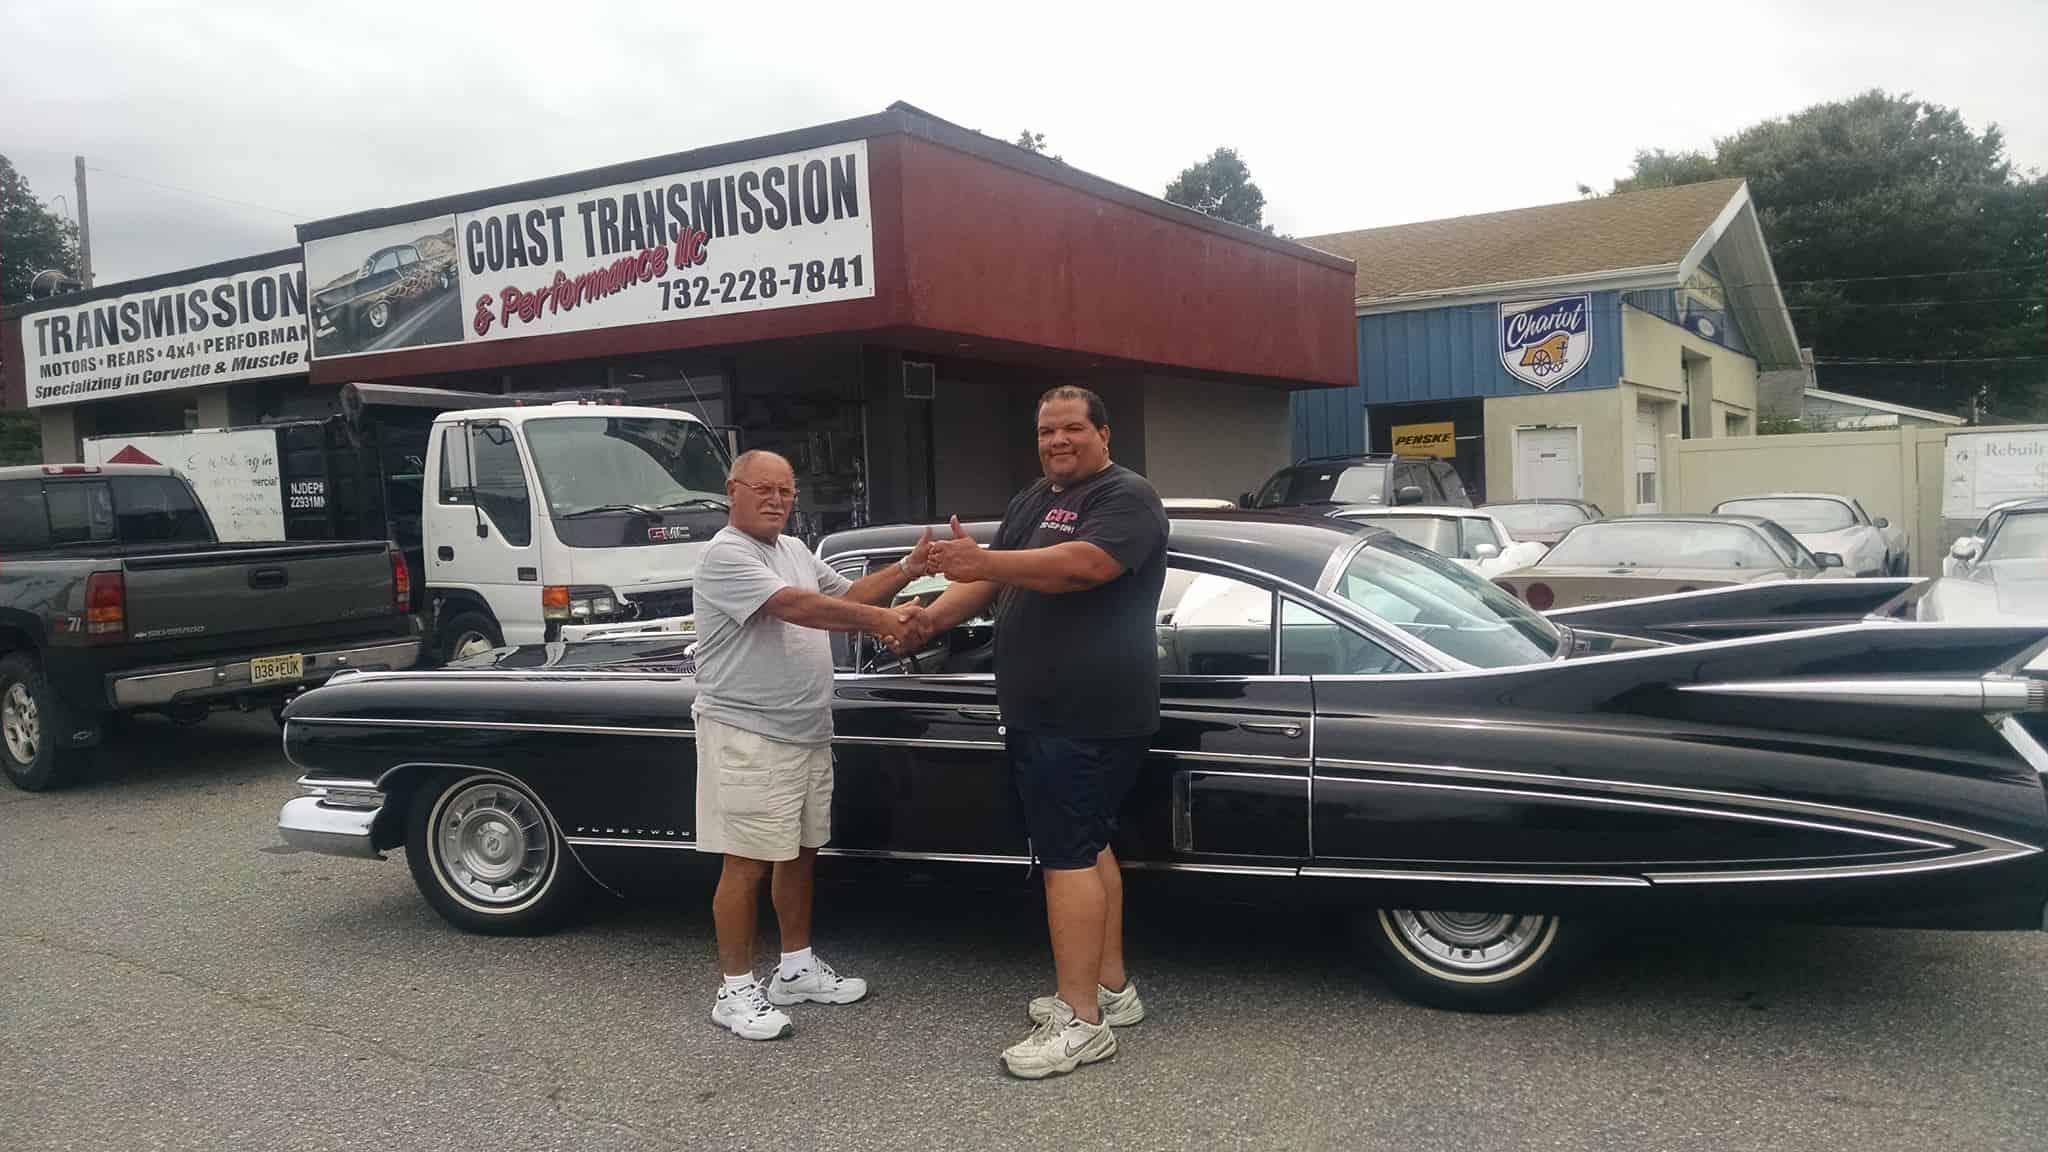 1959 Cadillac Restoration